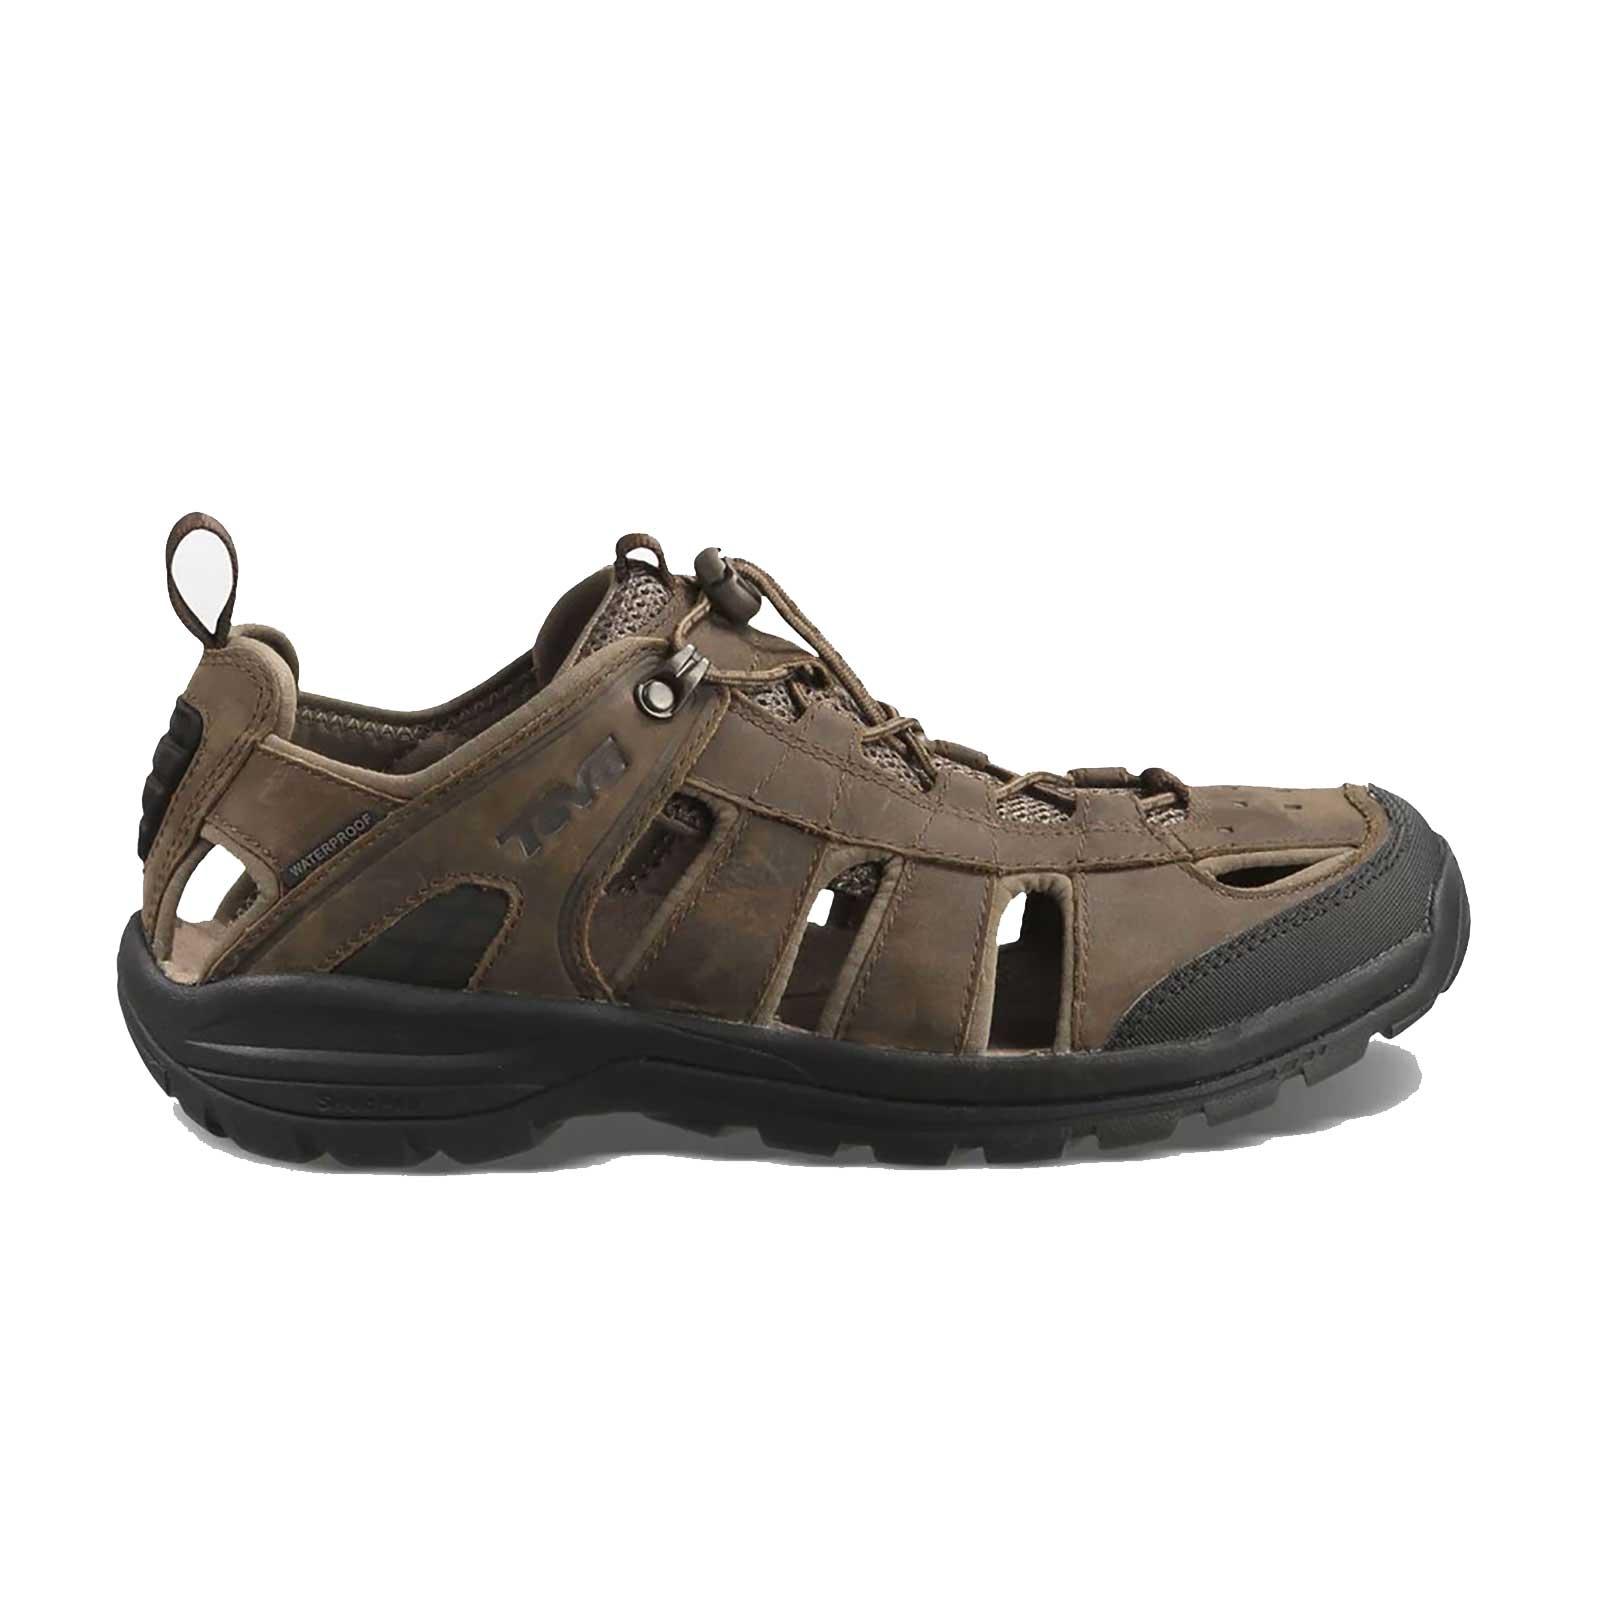 b518226aff8f03 Details about Teva Mens Kimtah Leather Sandal